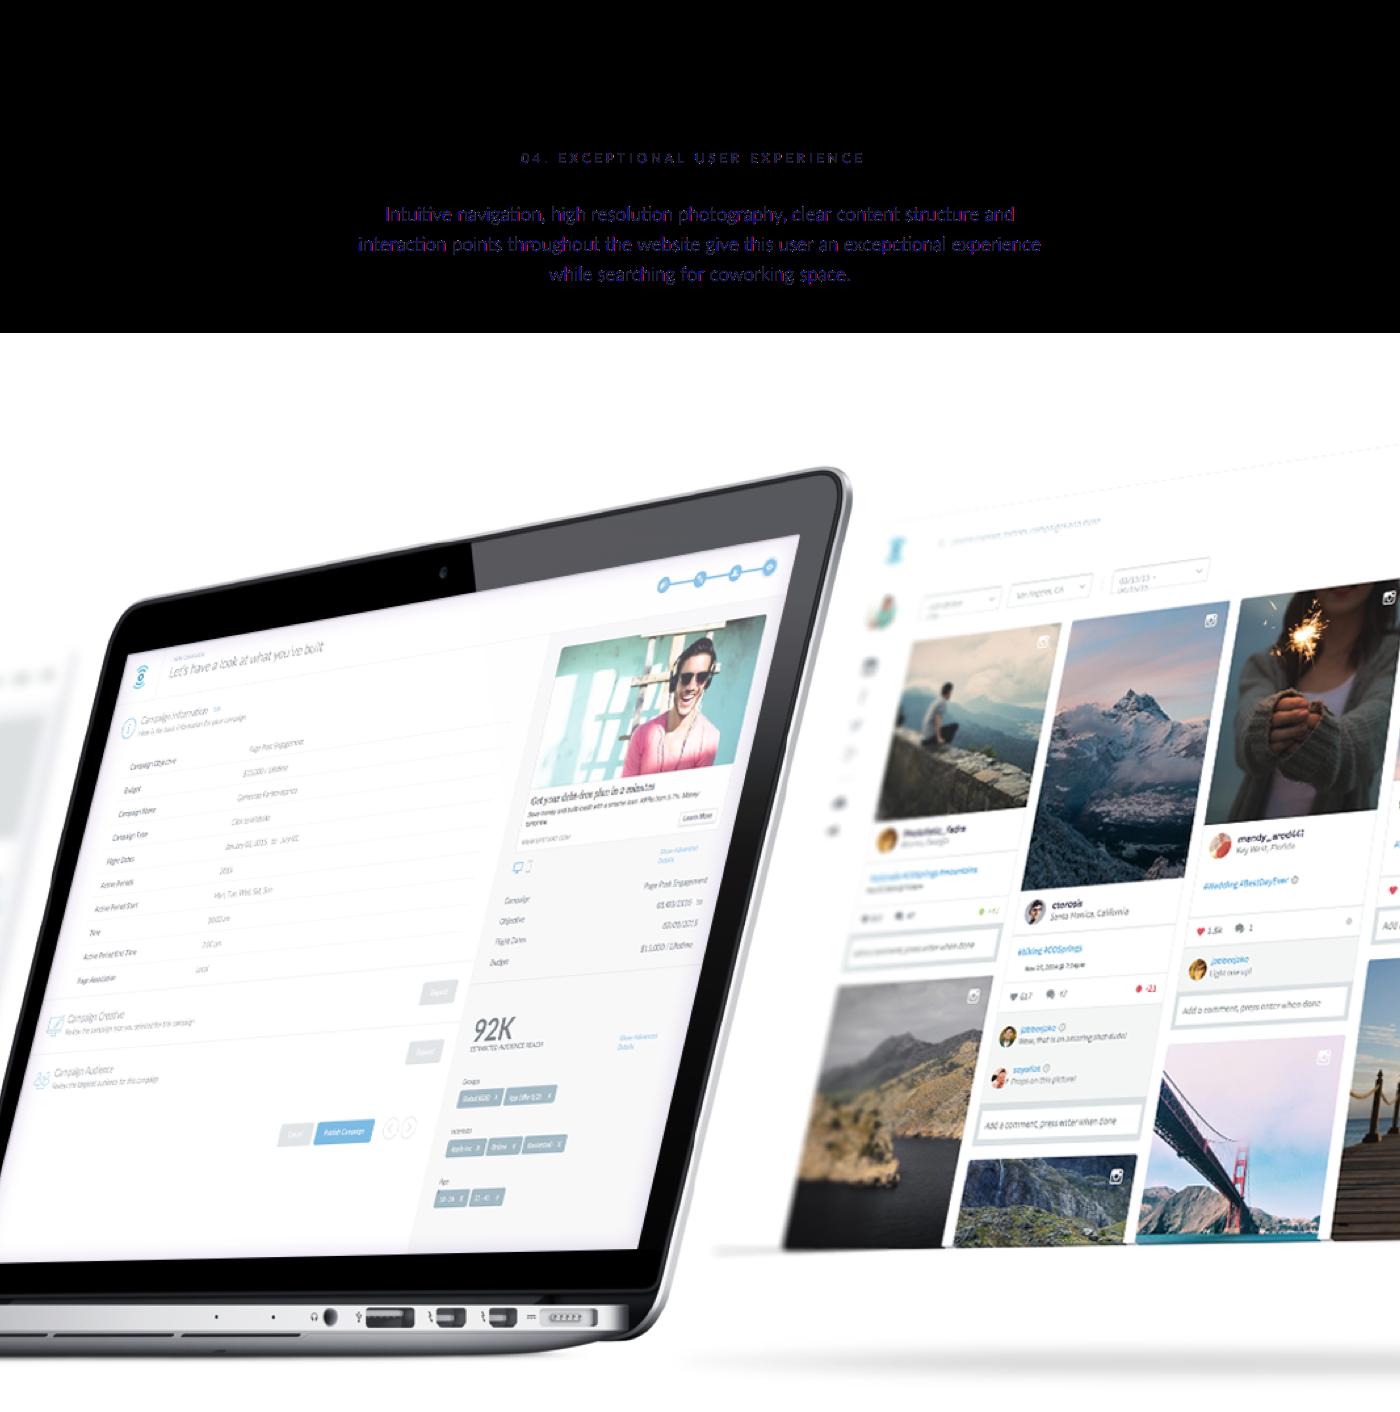 feed design clean Web app user web app web application application marketing   campaign logo navigation Interface interfaces